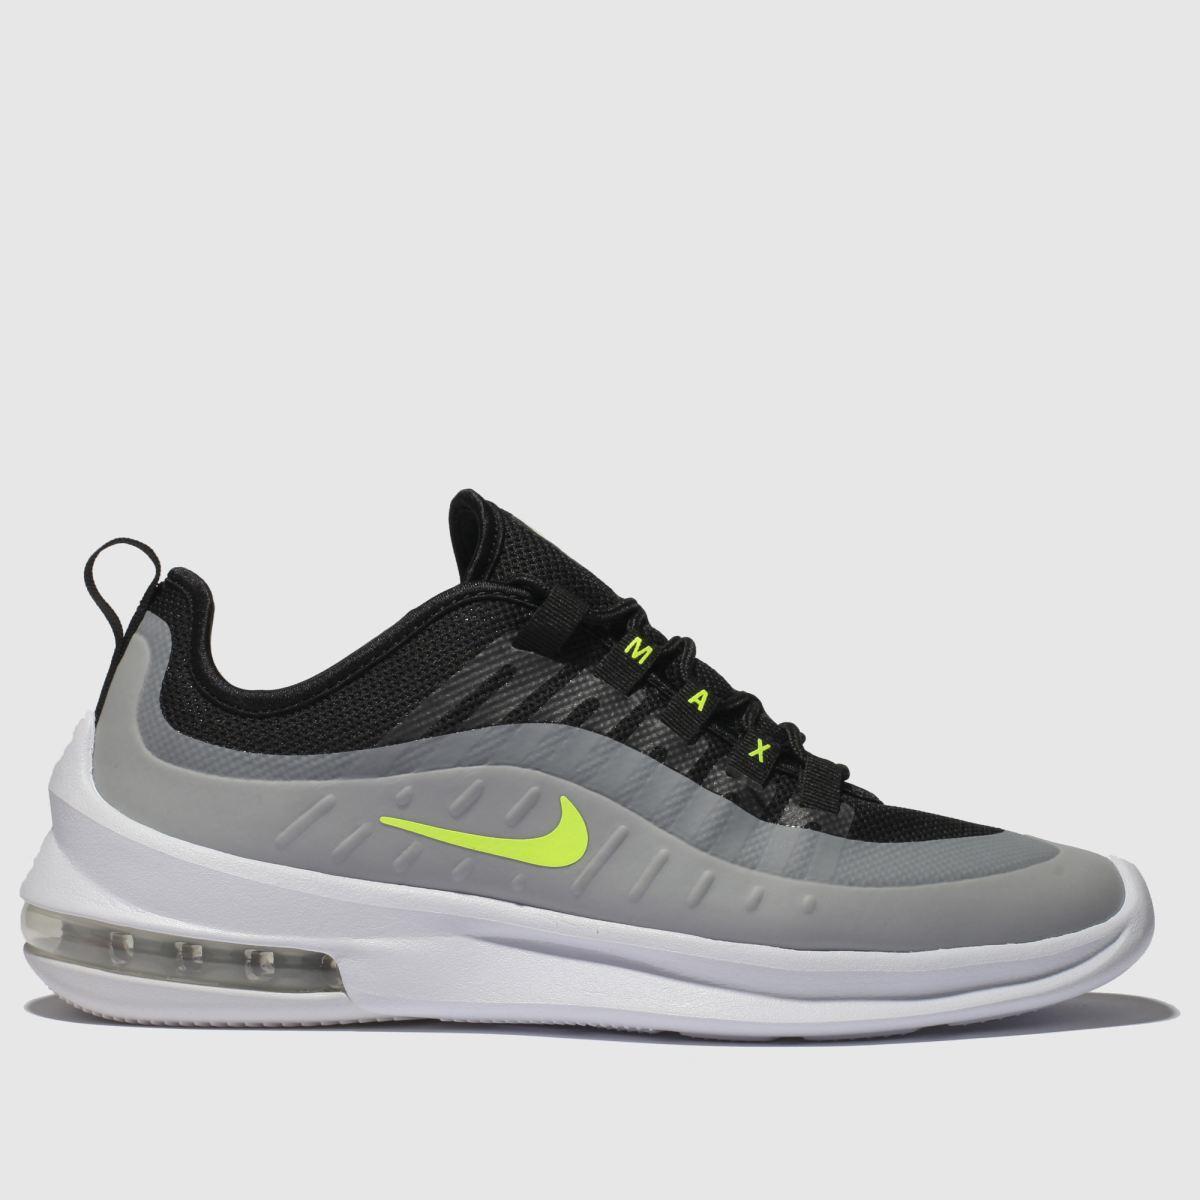 Nike Black & Grey Air Max Axis Trainers